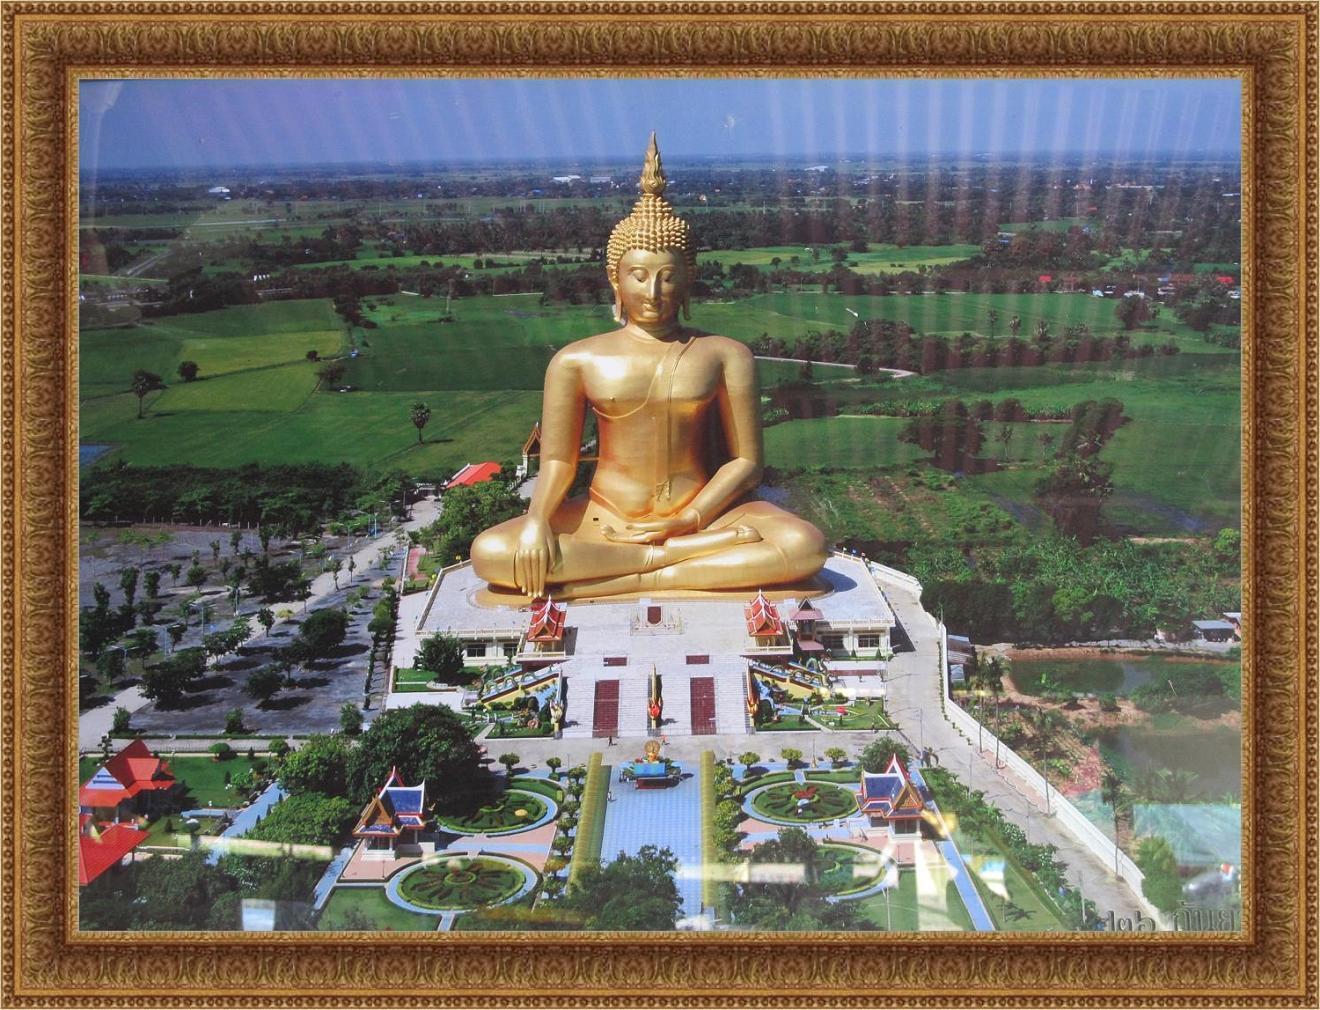 Letecký pohled - Wat Muang - Thajsko